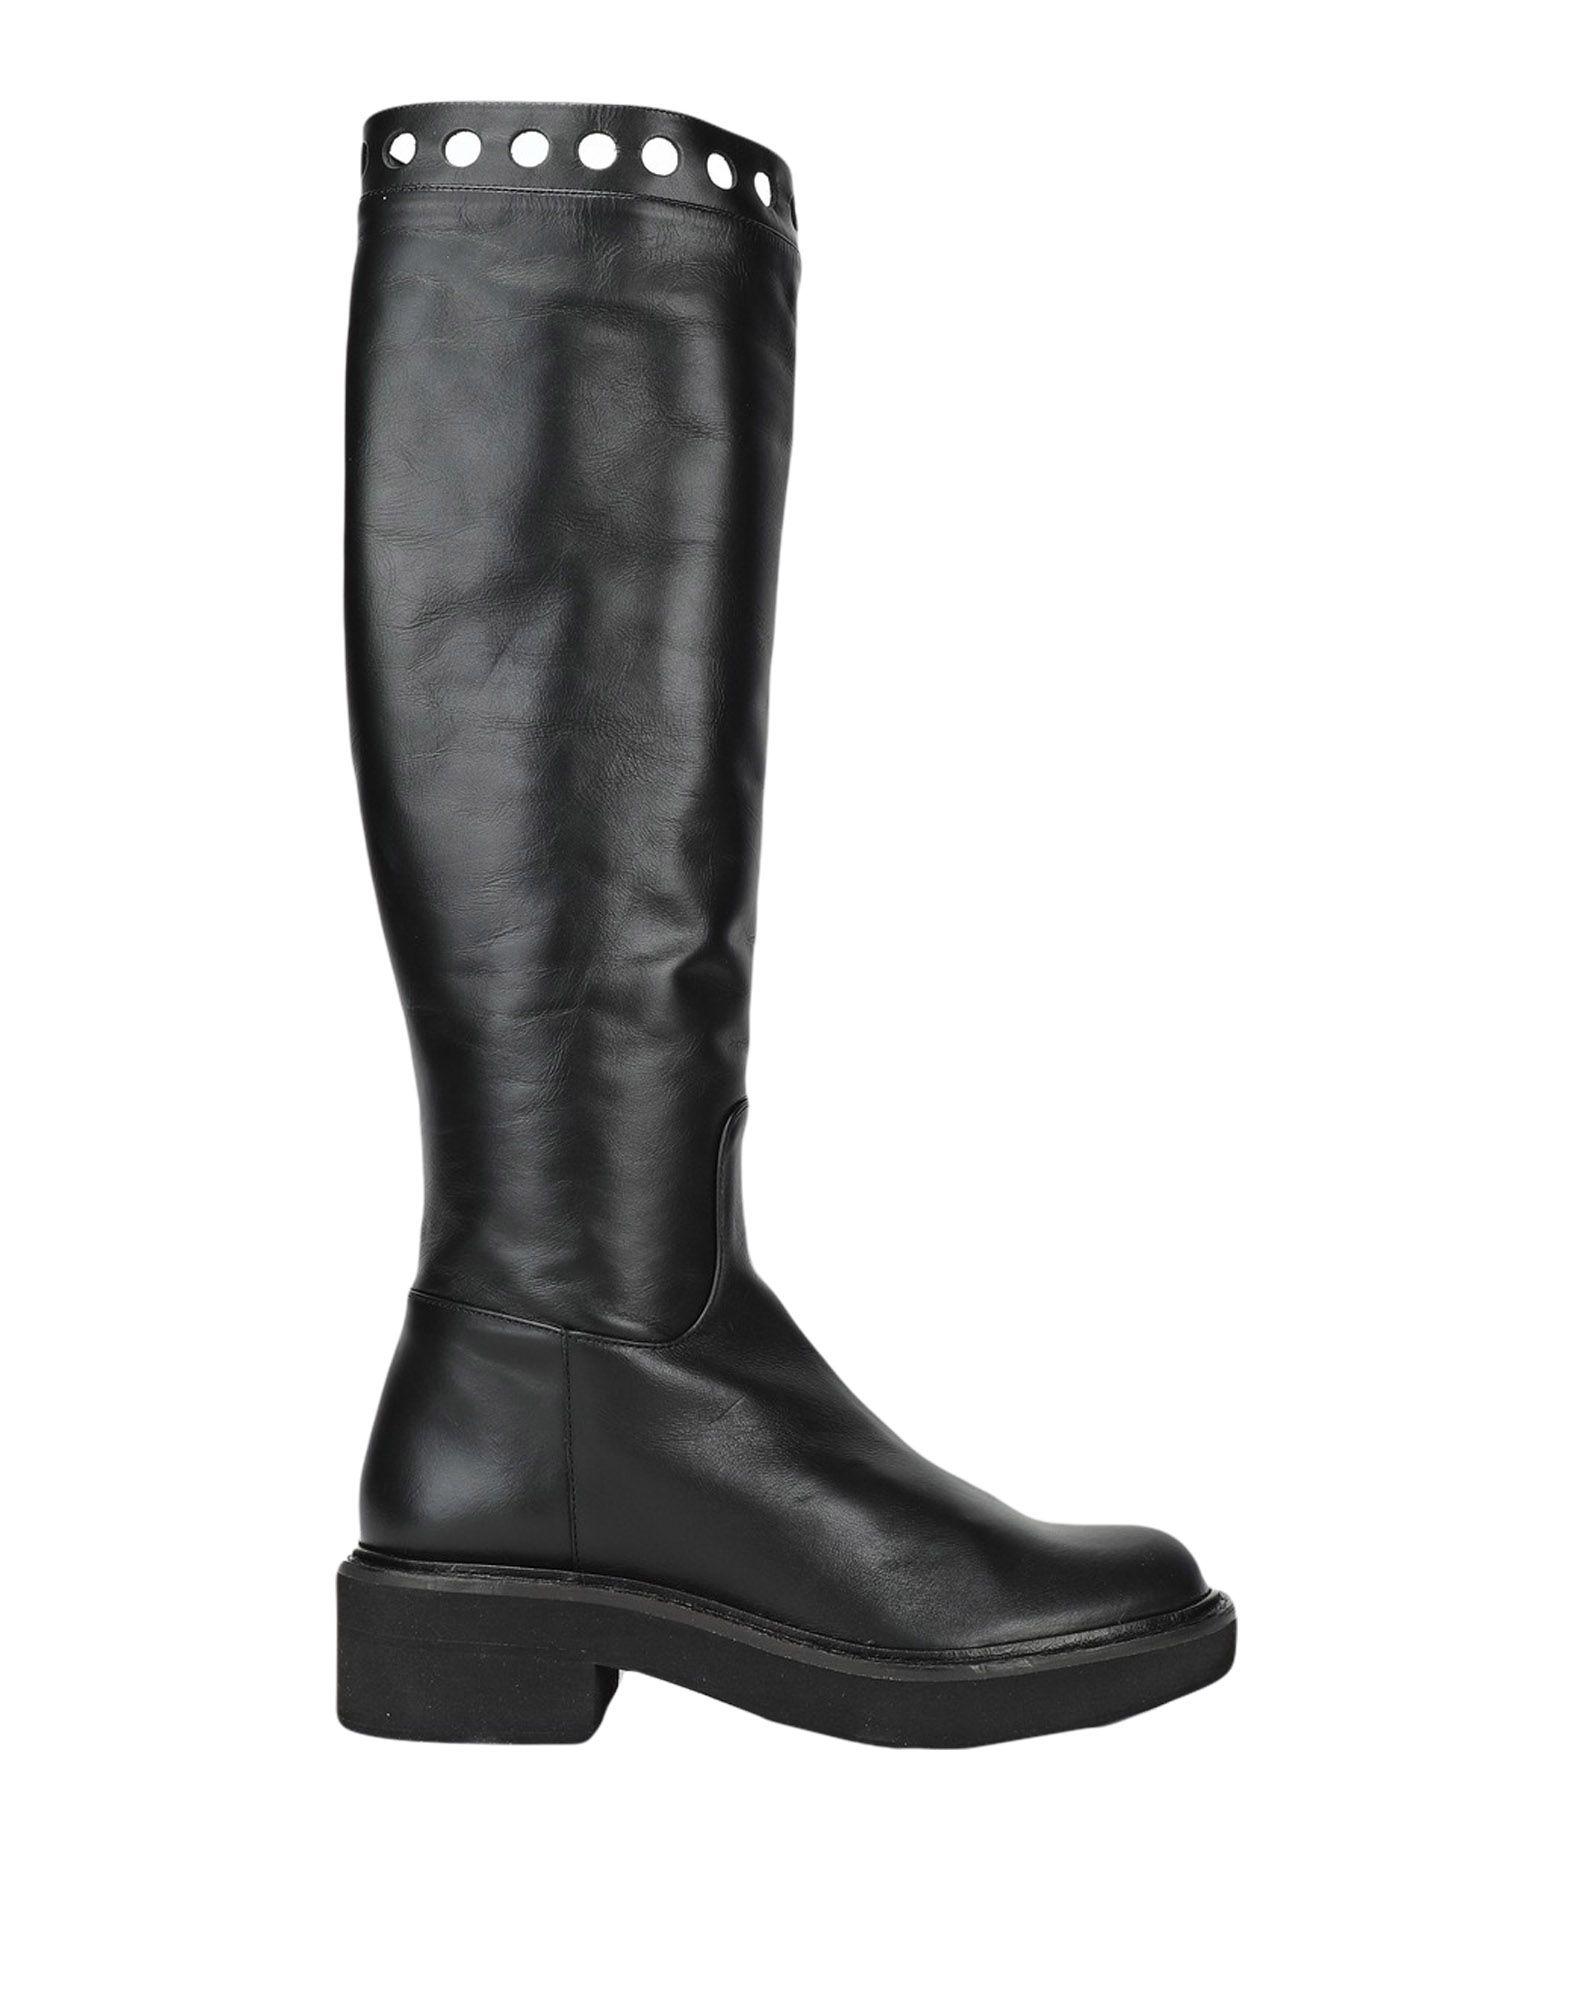 Paloma Paloma Barceló Boots - Women Paloma Paloma Barceló Boots online on  United Kingdom - 11510220PG 96609d